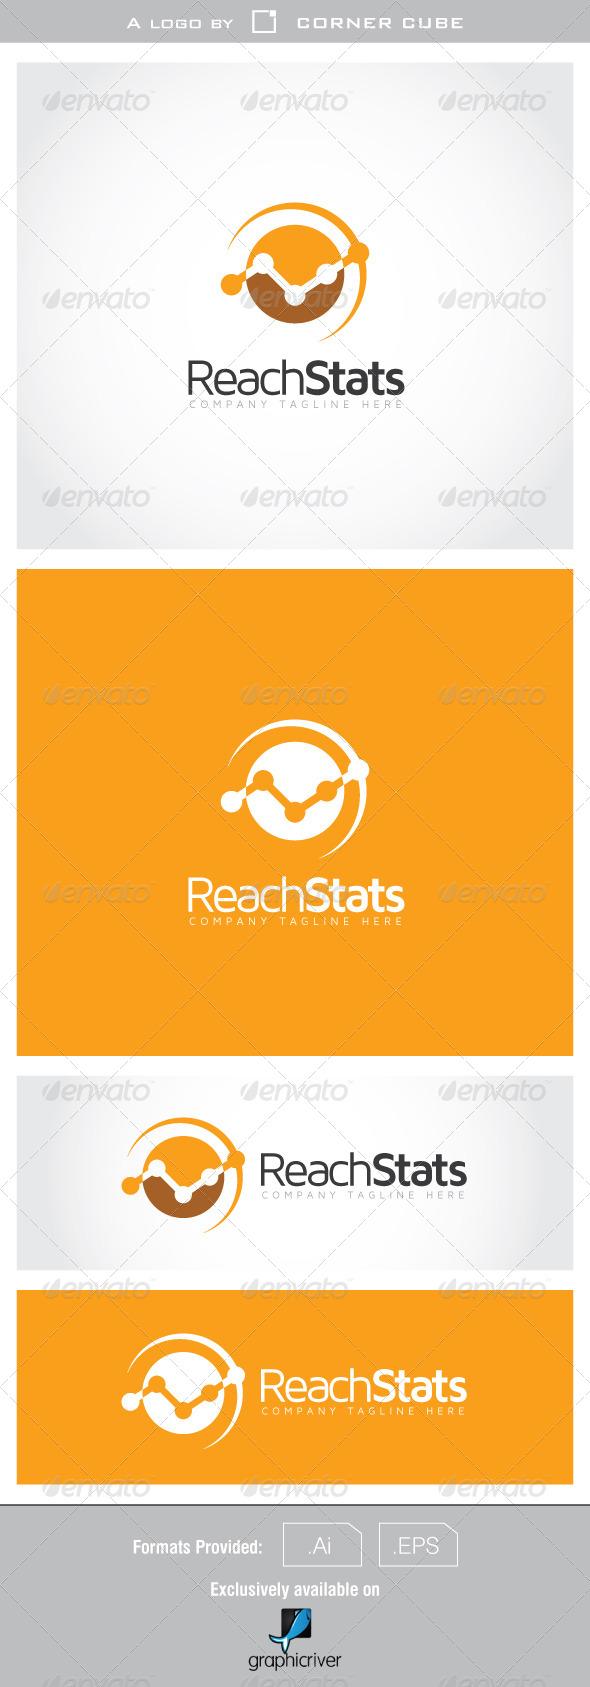 Reach Stats Logo